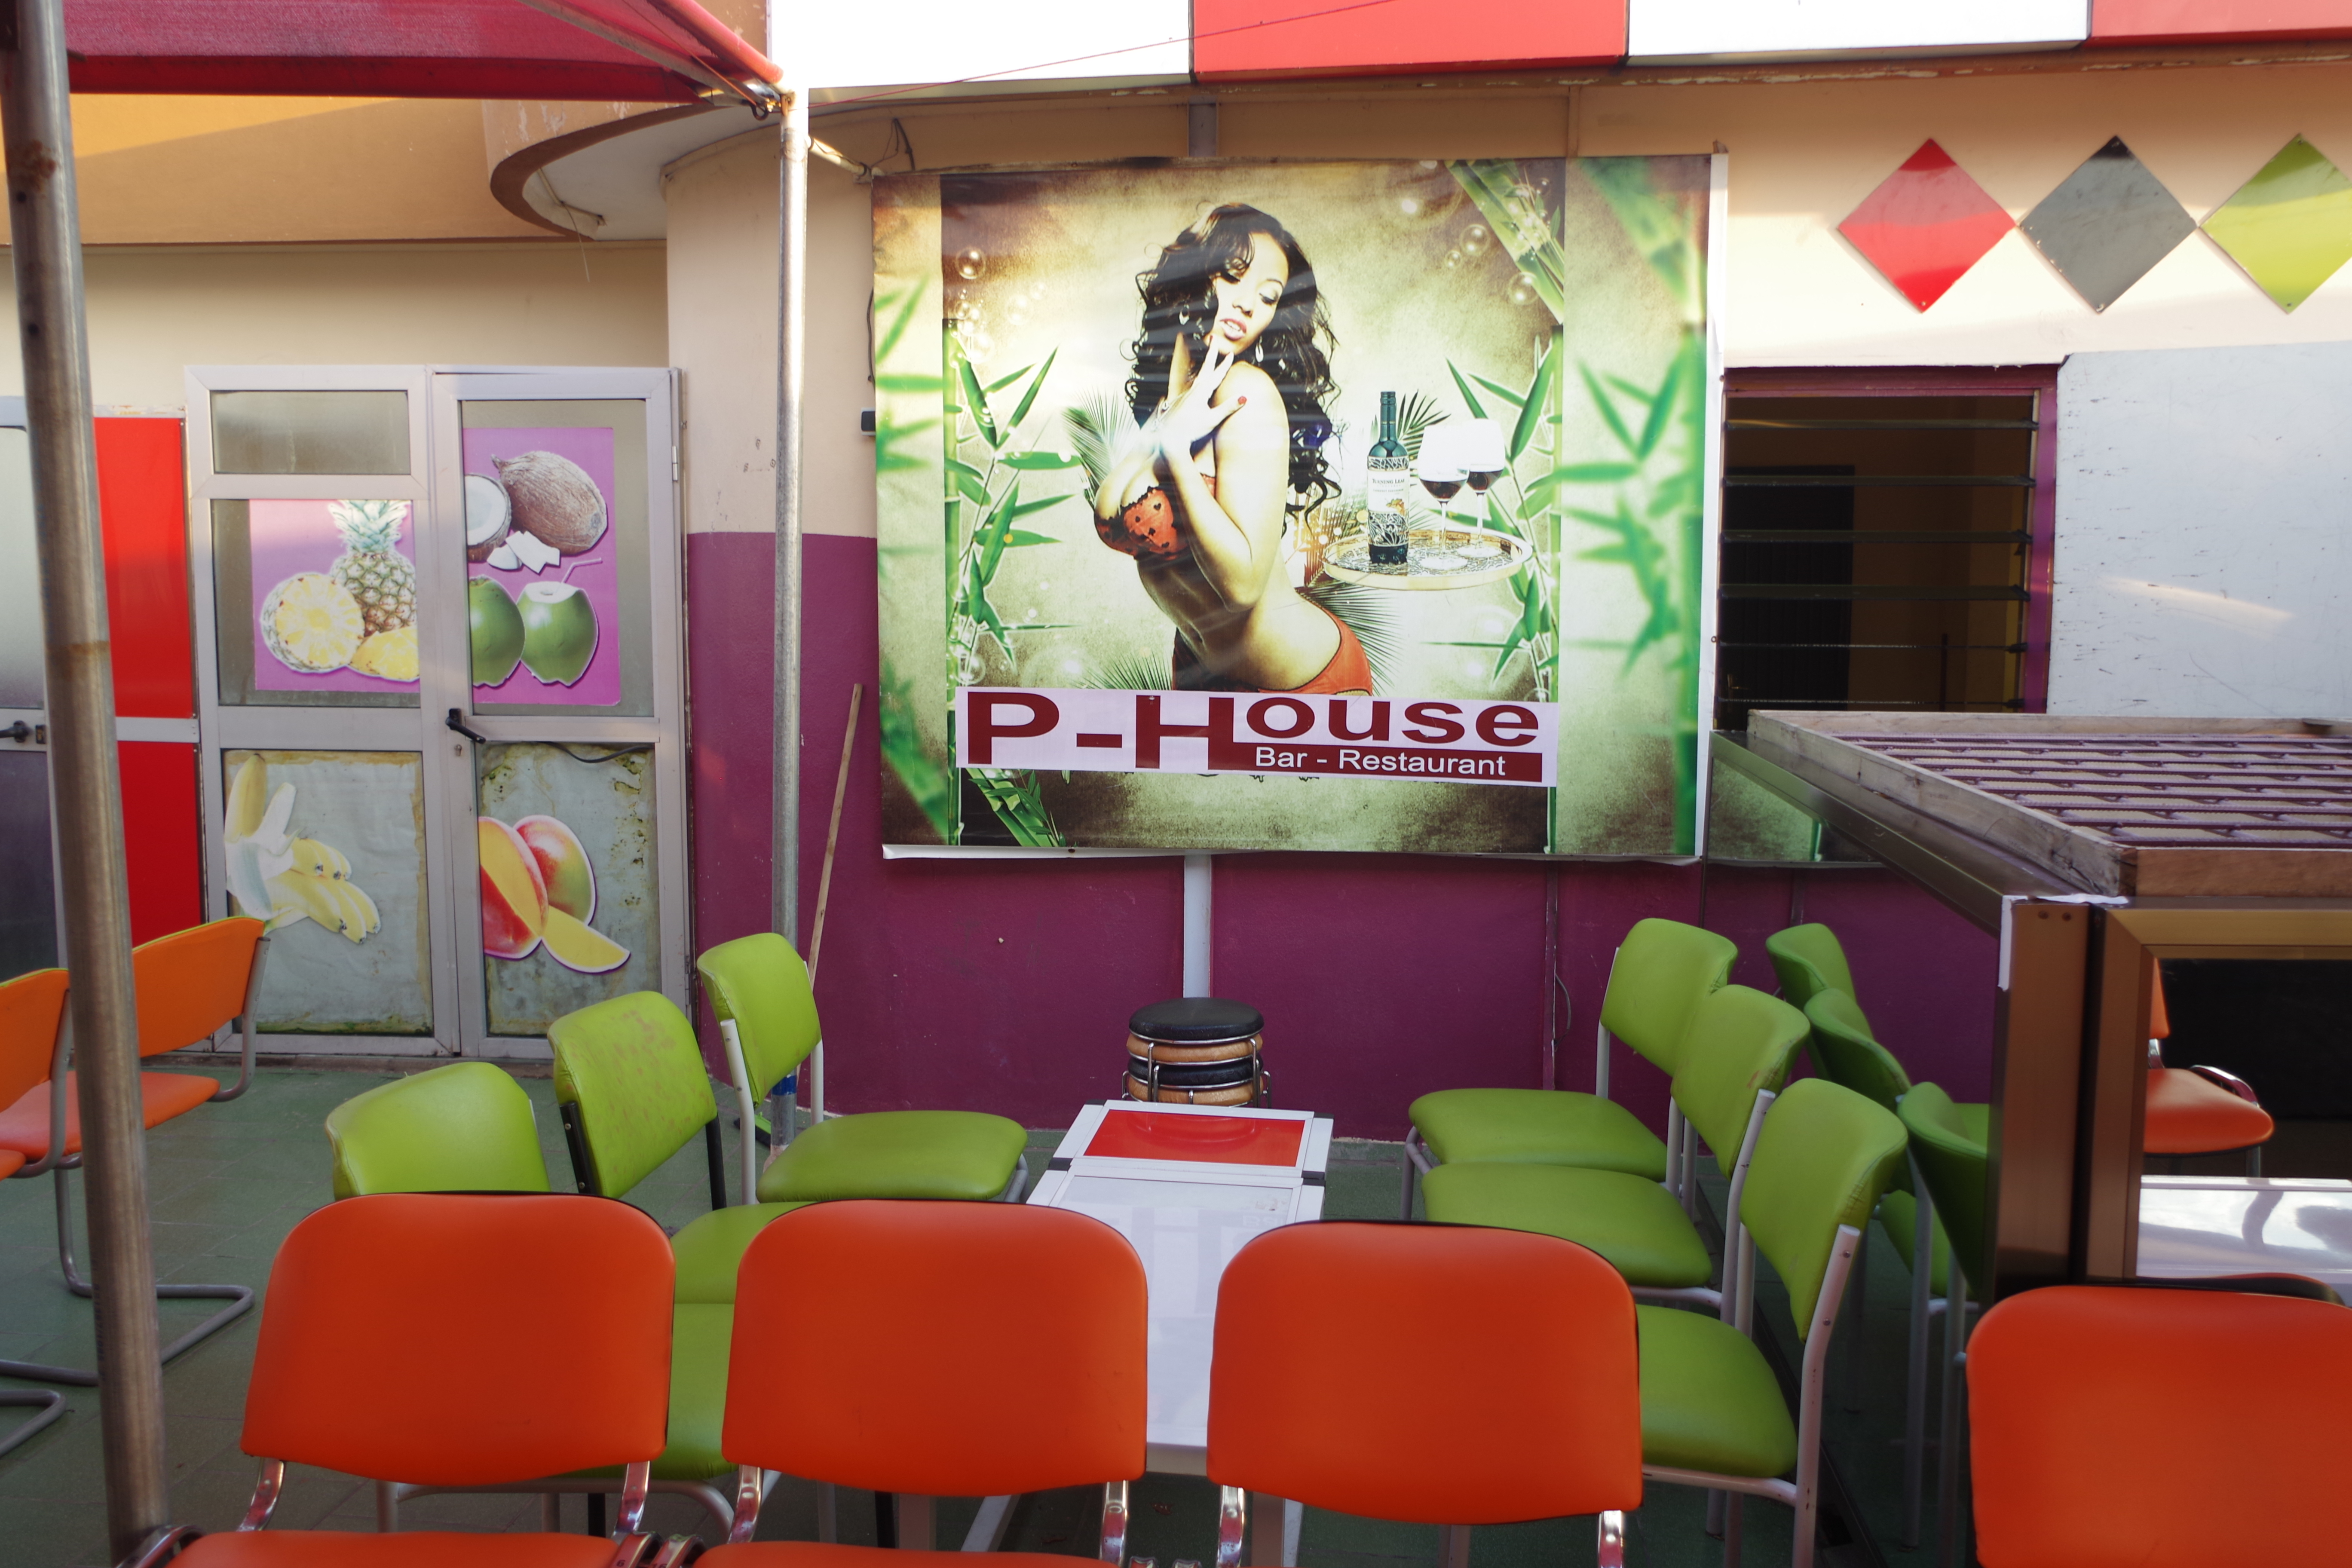 Restaurant Interieur Design.File Interieur D Un Bar Restaurant A Cotonou Benin1 Jpg